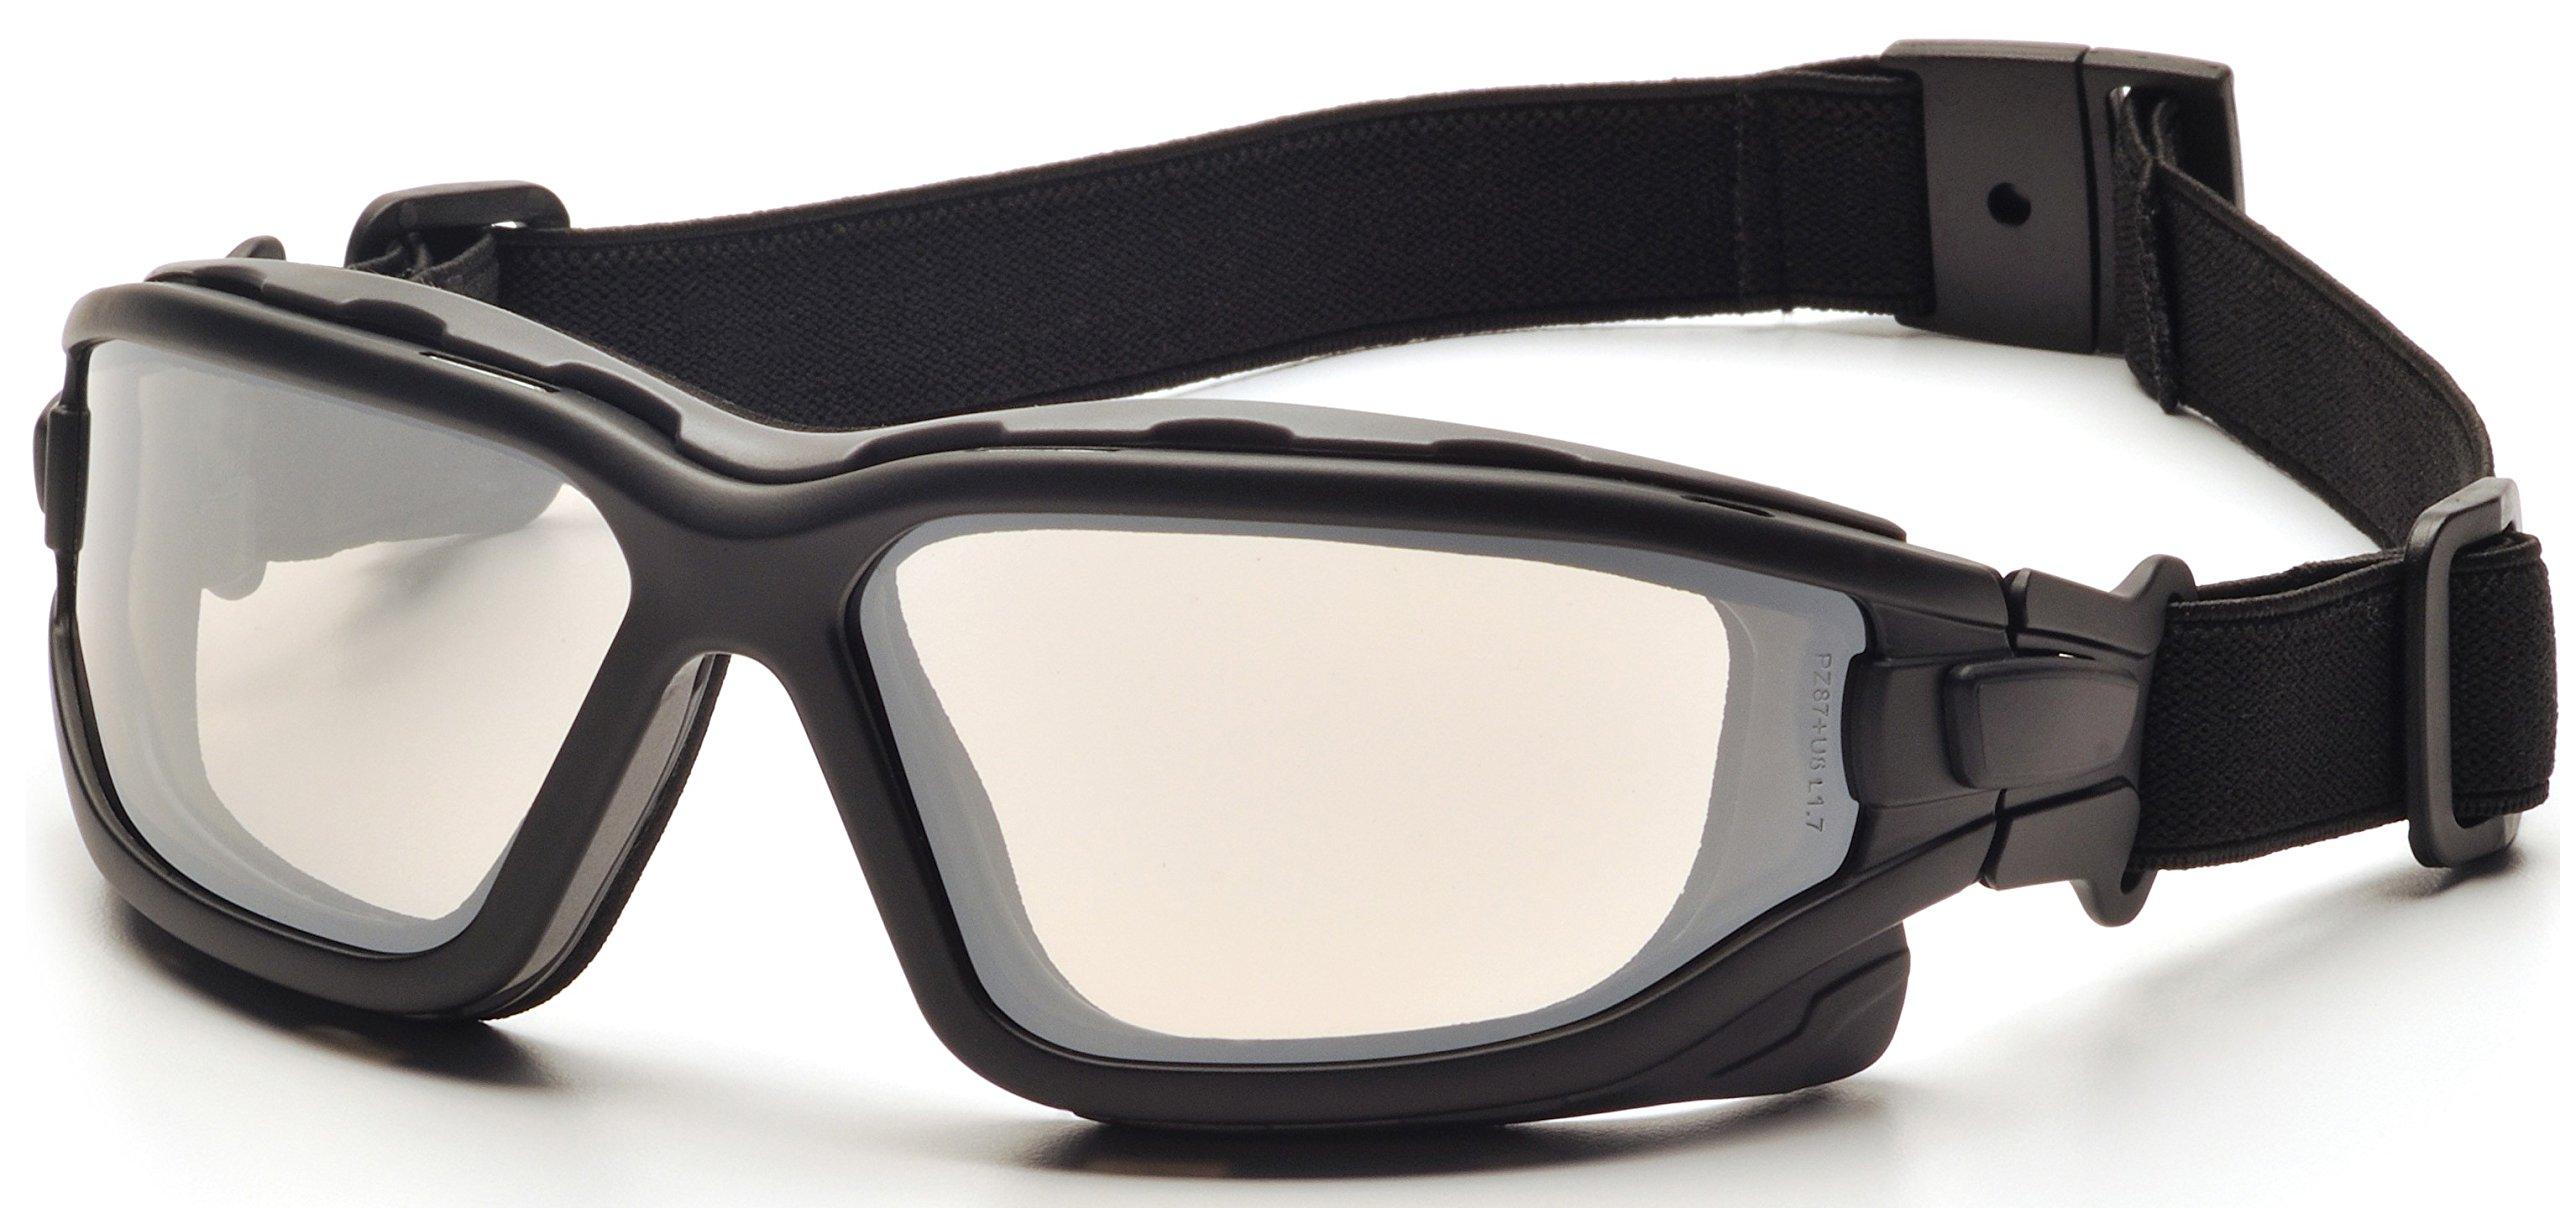 Pyramex I-Force Sporty Dual Pane Anti-Fog Goggle, Indoor/Outdoor Mirror Anti-Fog Lens